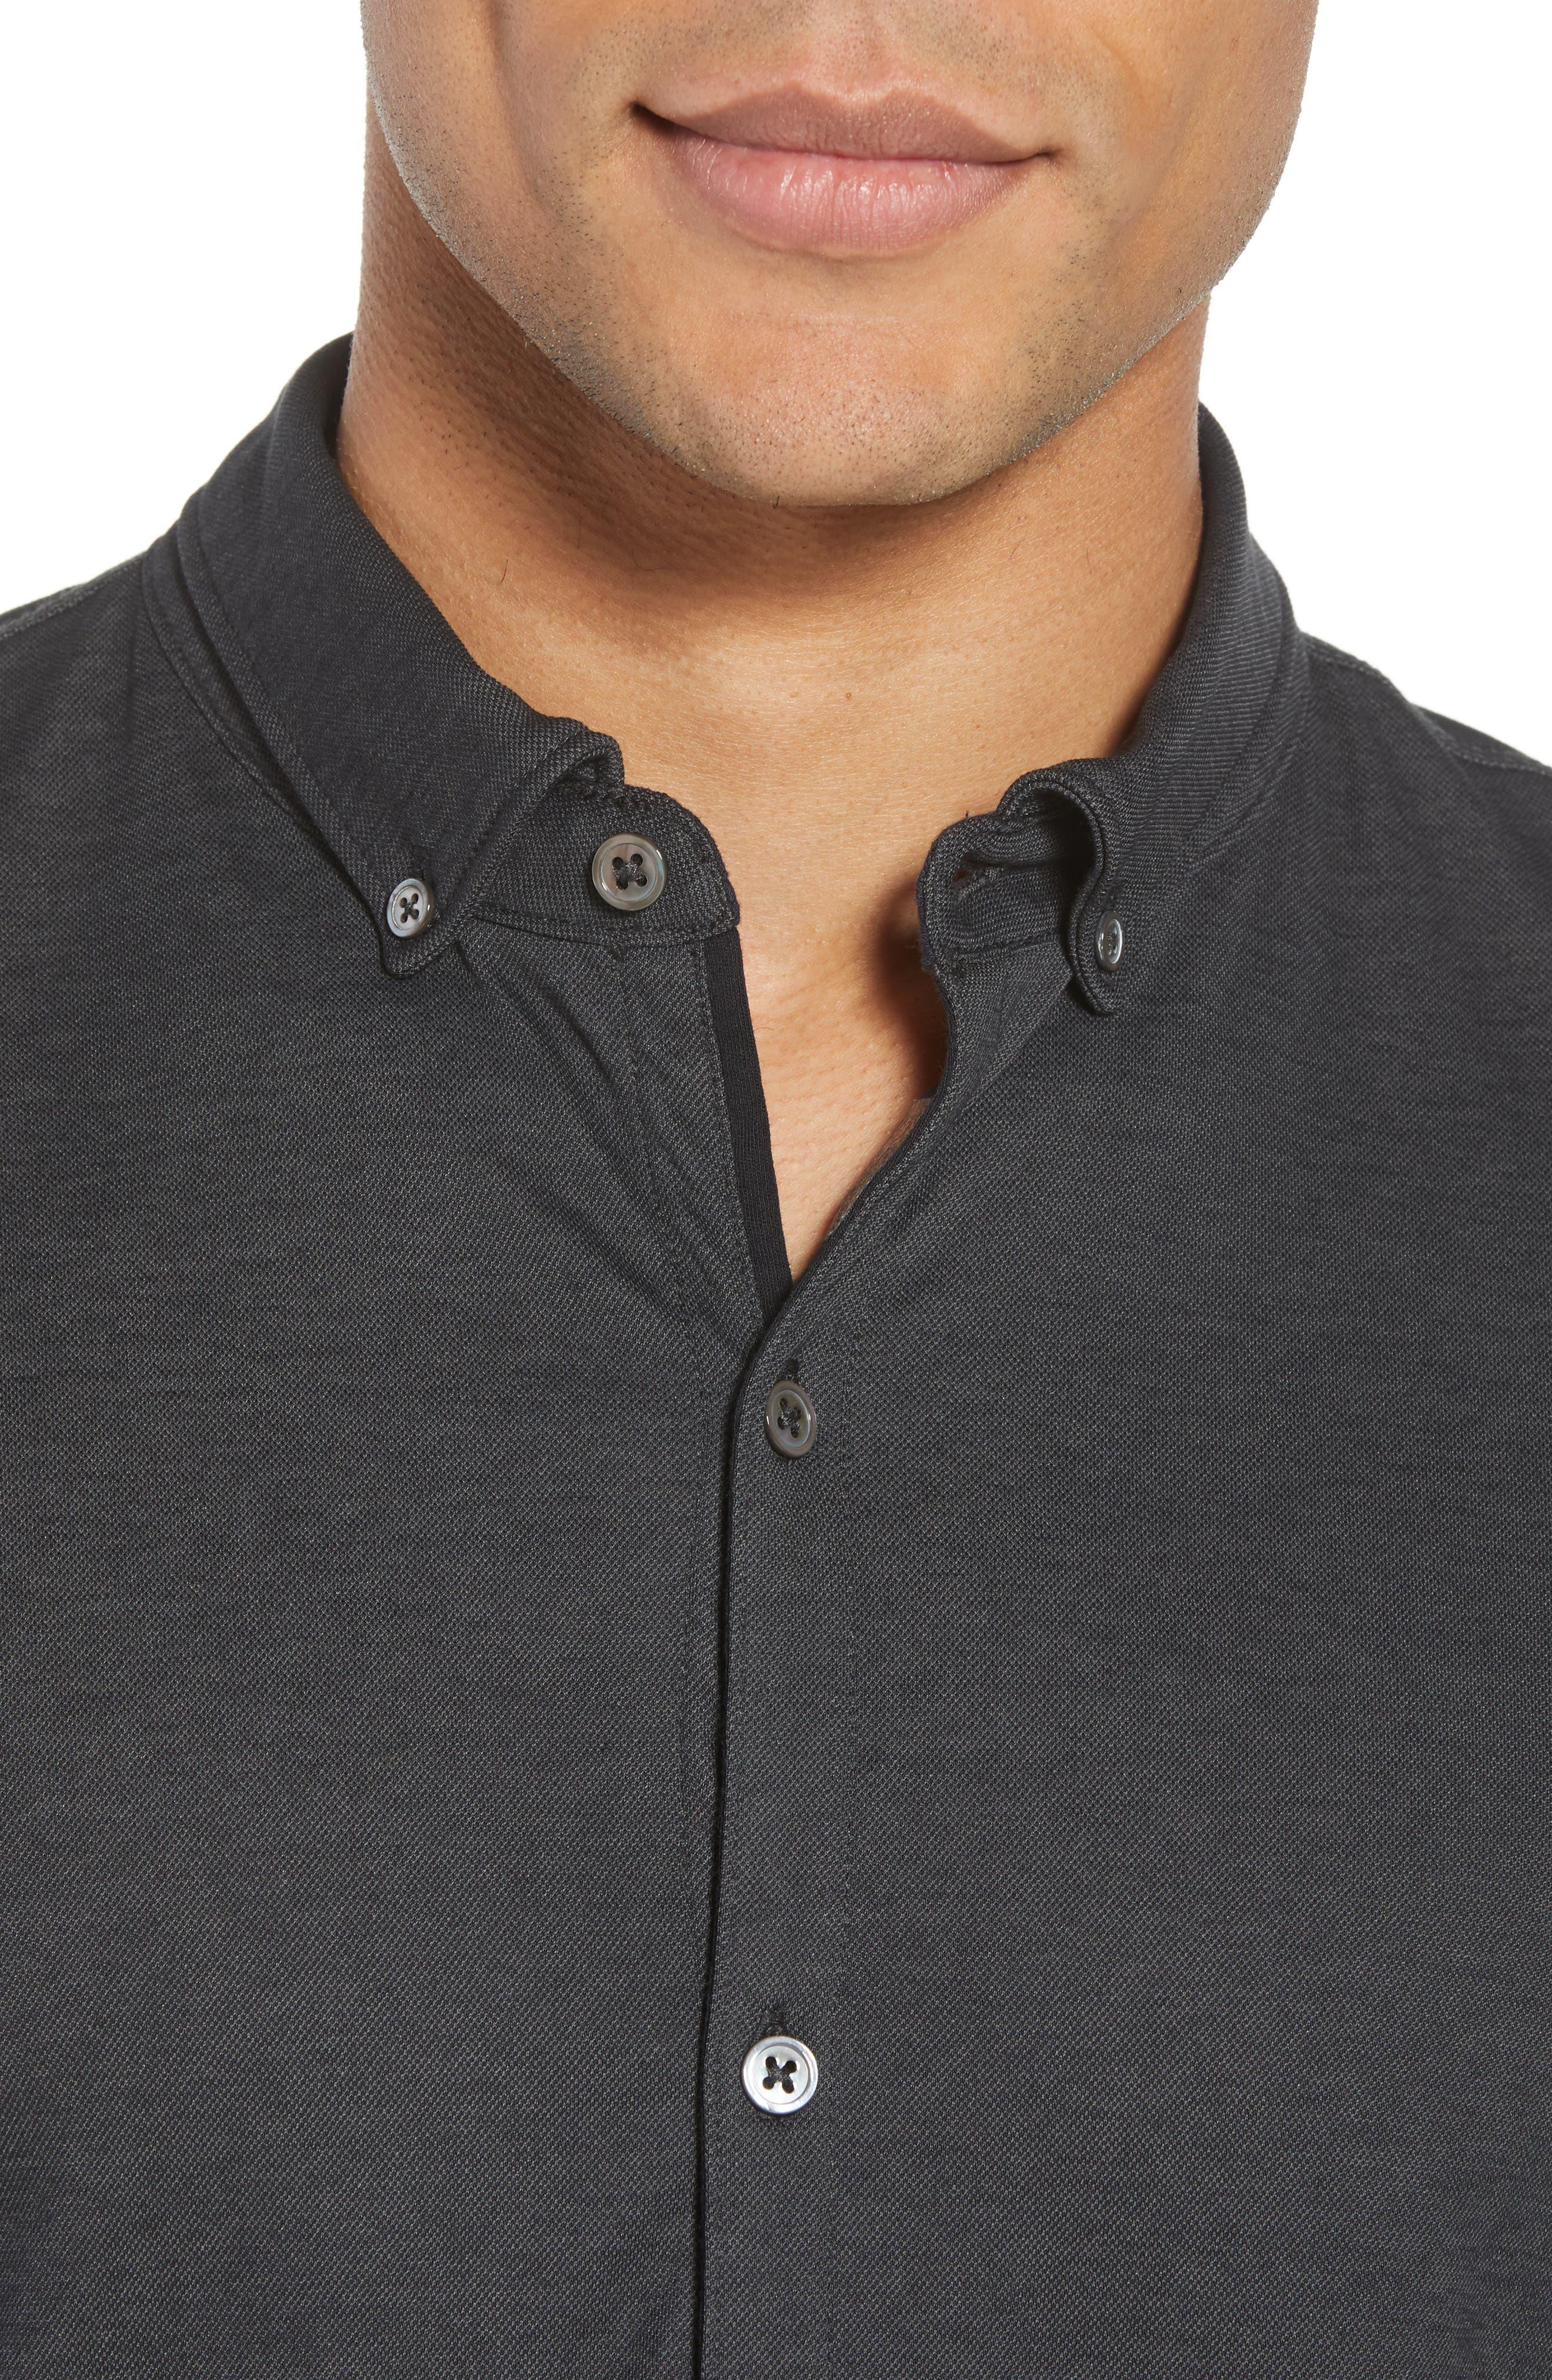 Caruth Piqué Sport Shirt,                             Alternate thumbnail 4, color,                             021